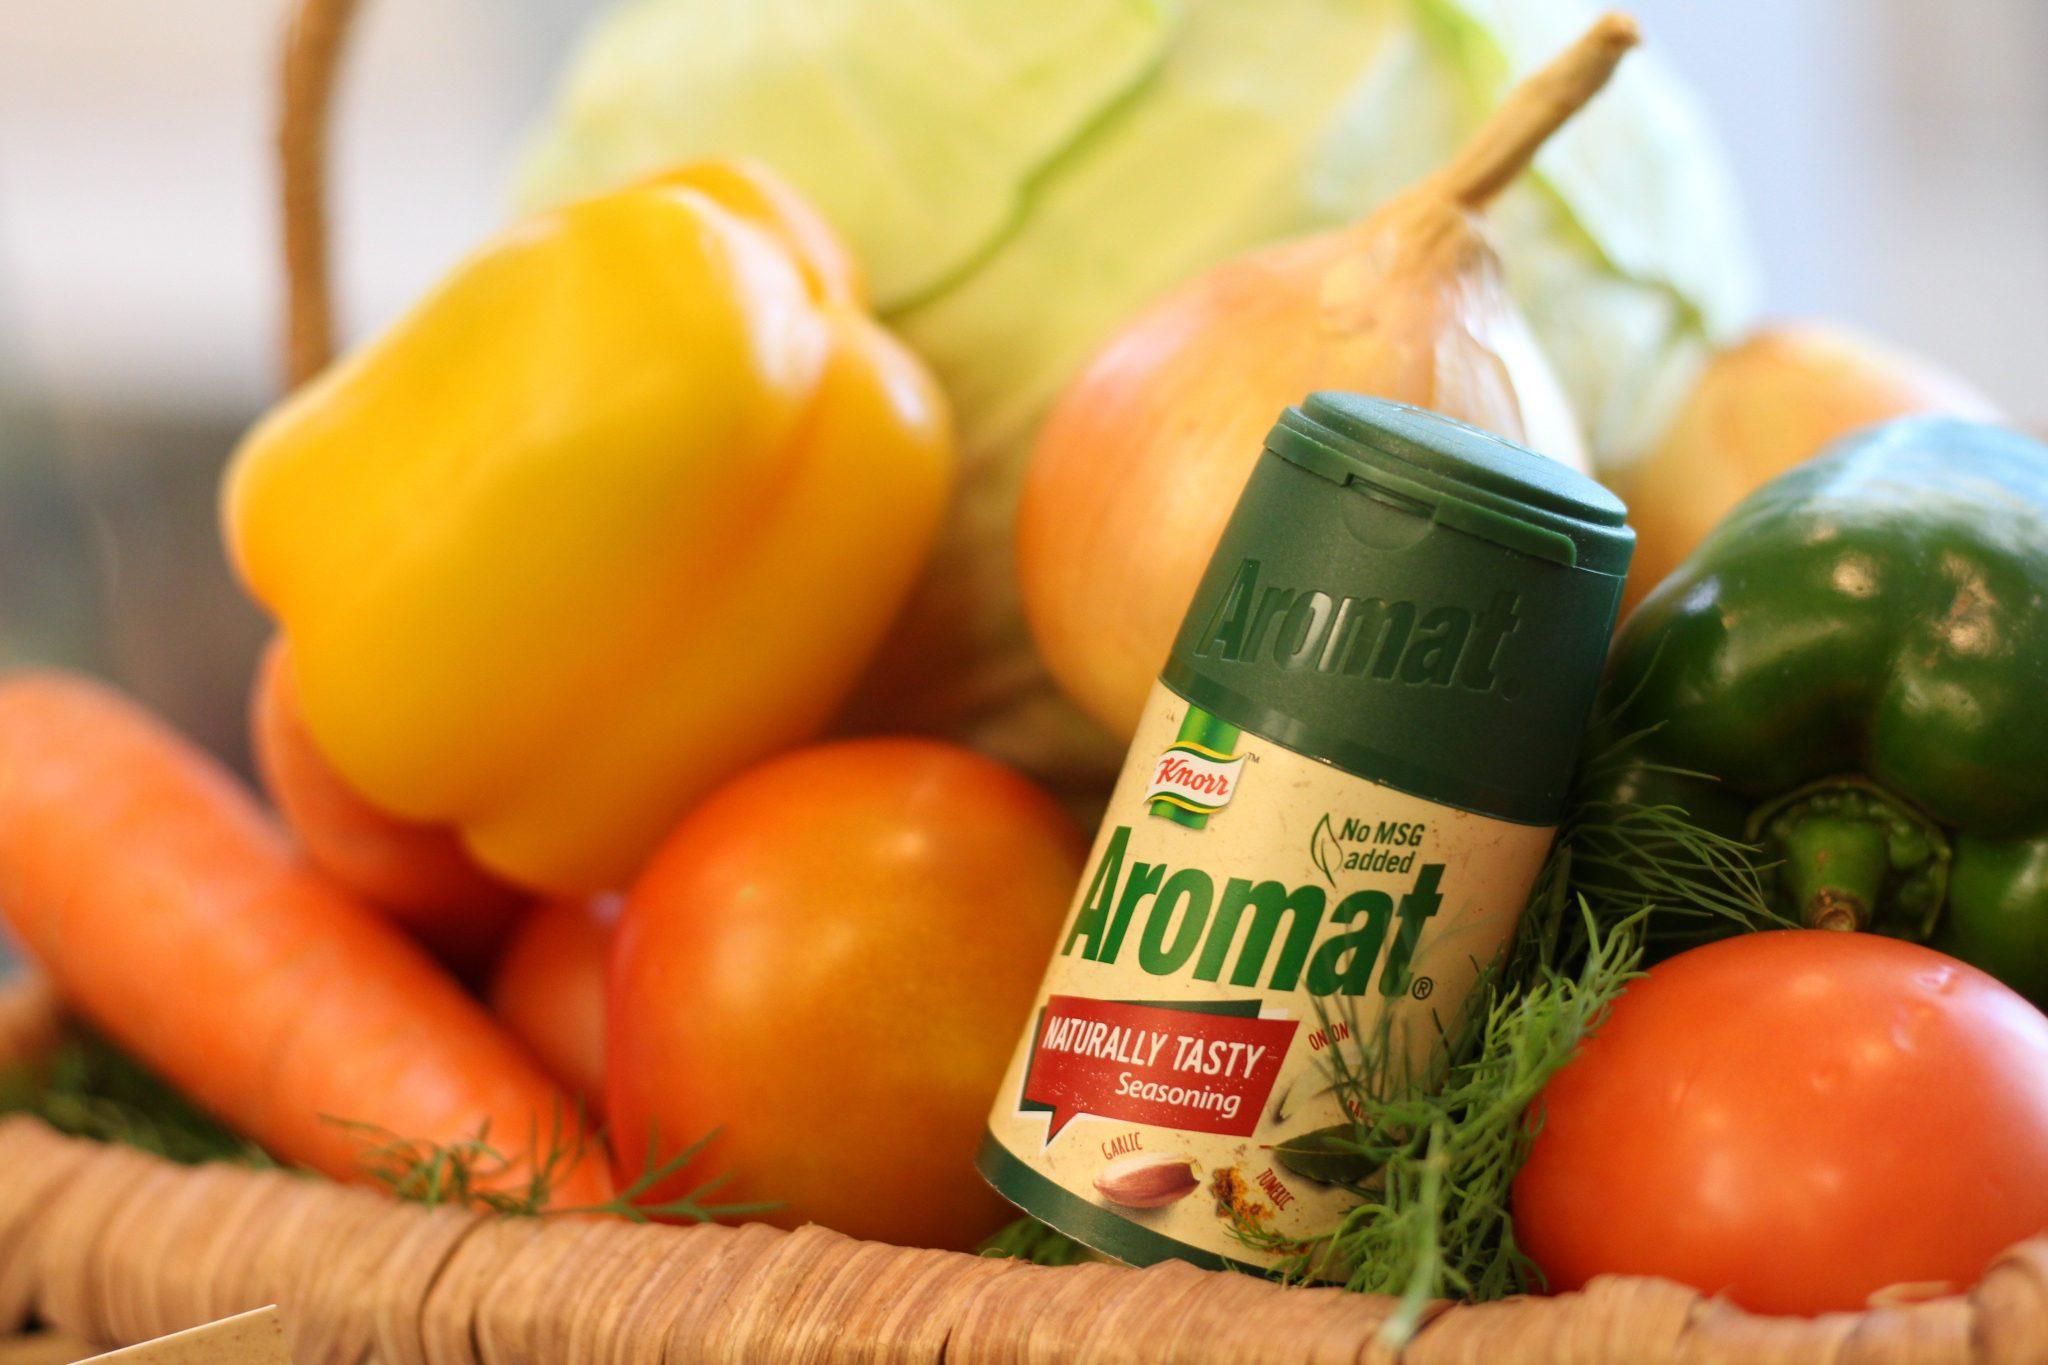 Aromat Naturally Tasty Packaging 2